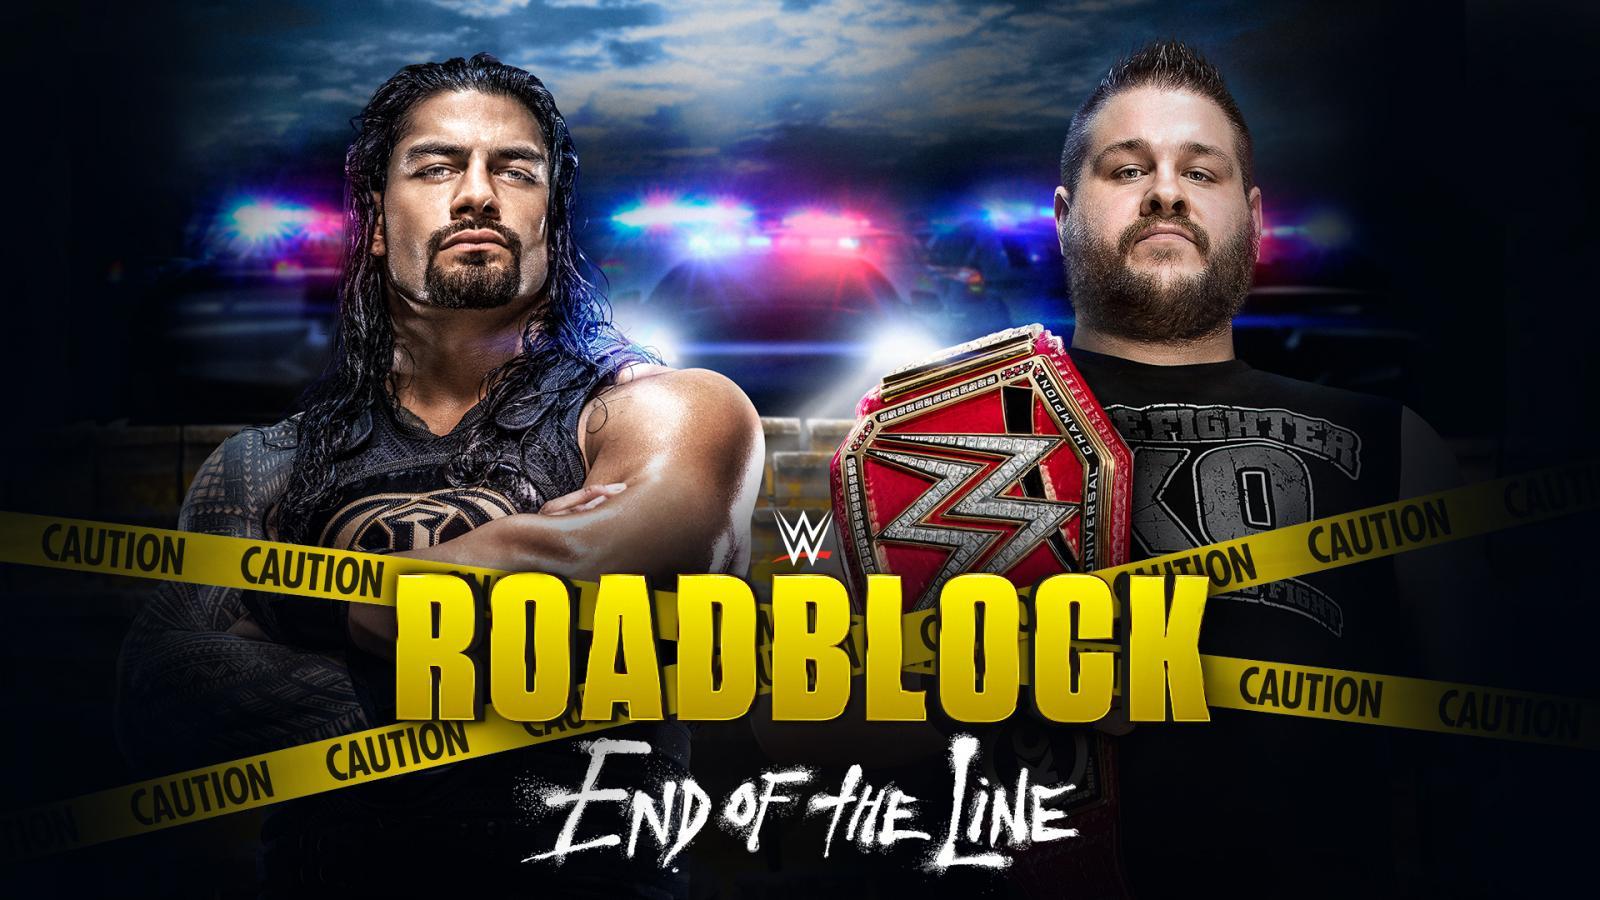 WWE Roadblock: End of Line Predictions